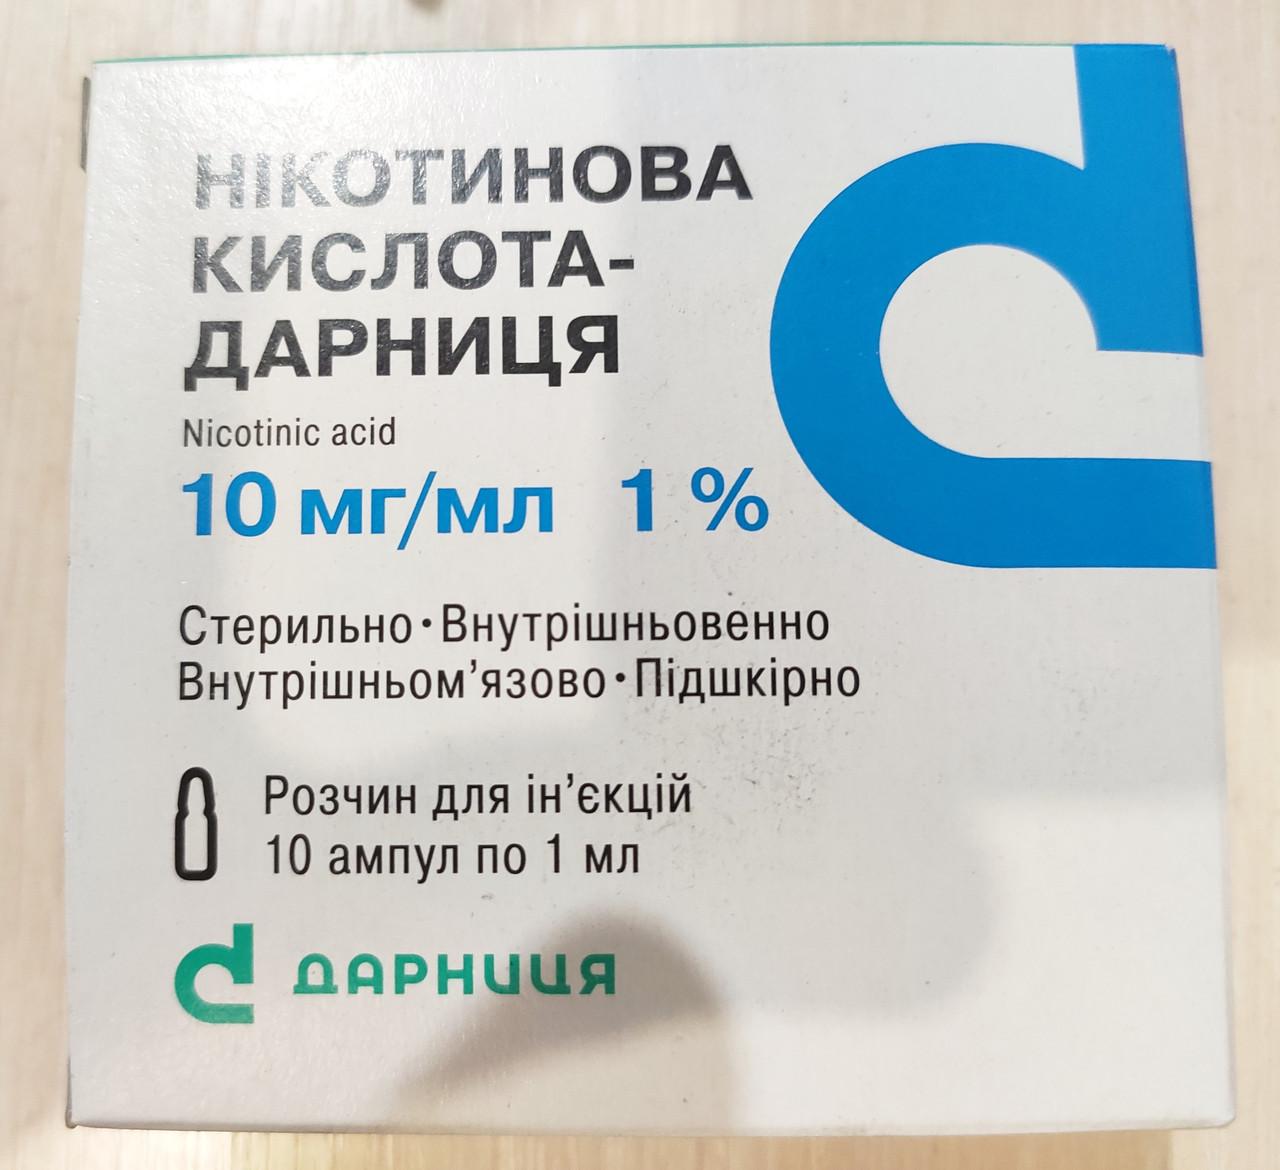 Кислота никотиновая-Дарница раствор 1% ампулы 1мл №10